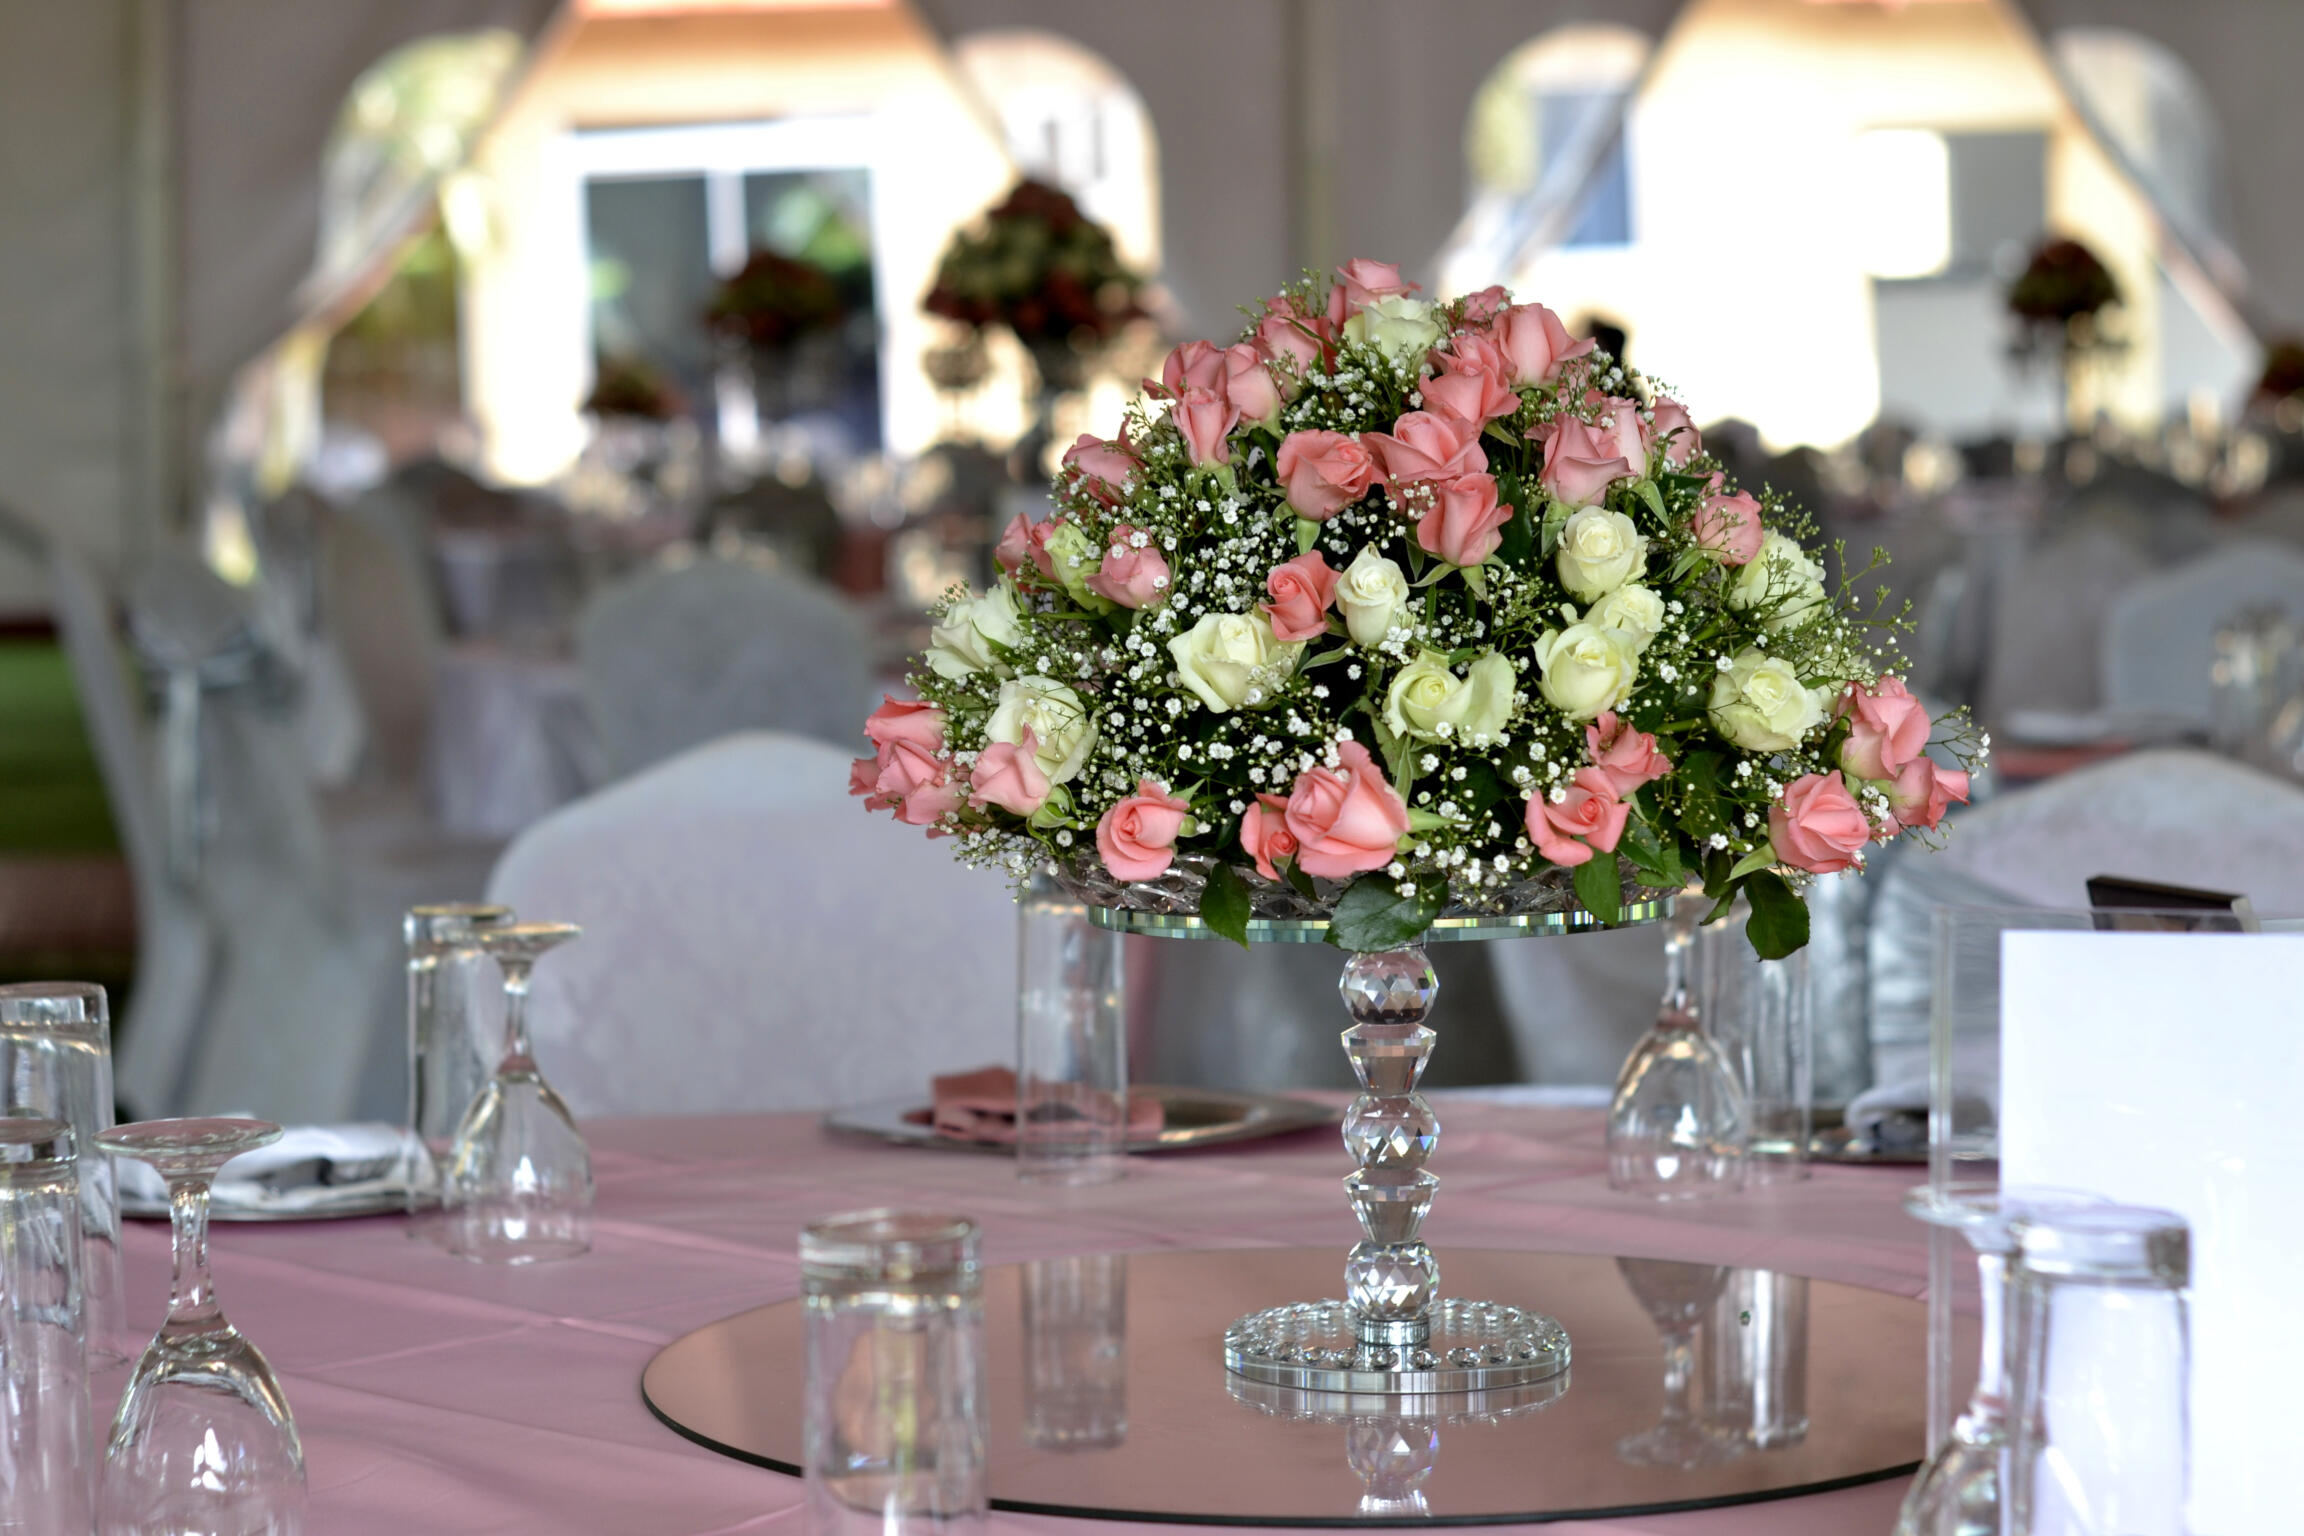 Flower decor on the table